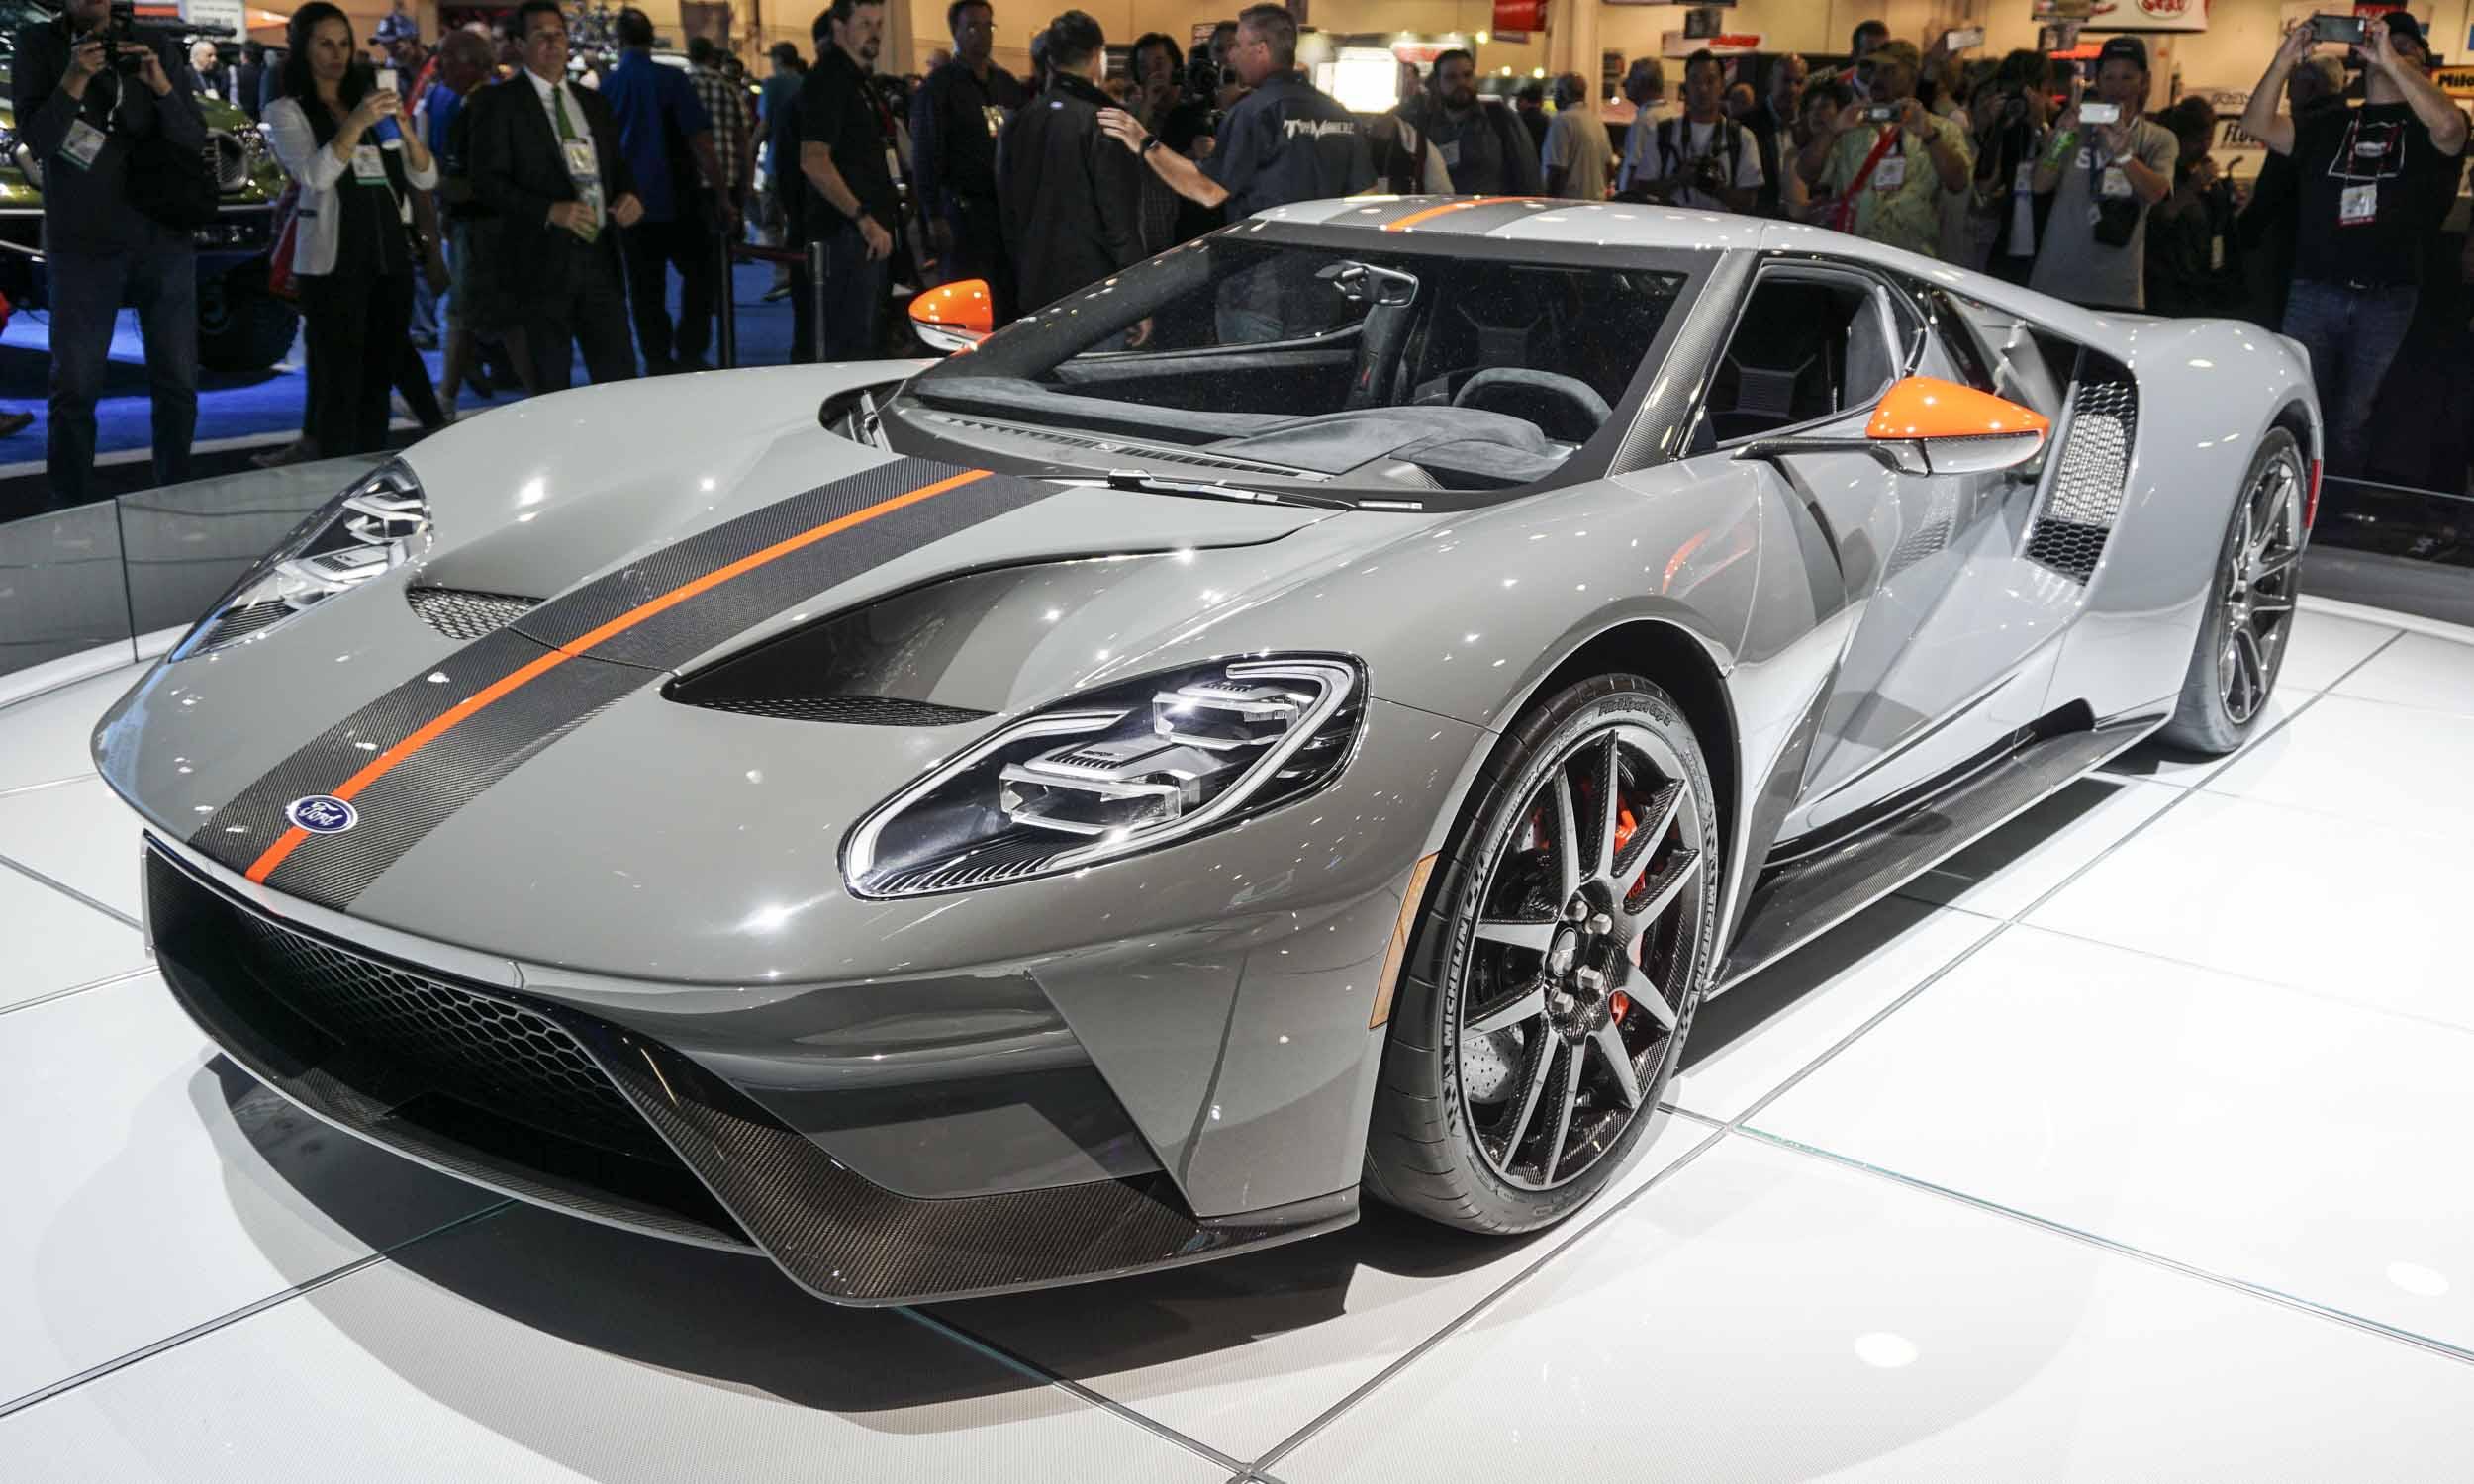 2018 SEMA Show 2019 Ford GT Carbon Seriesnbsp